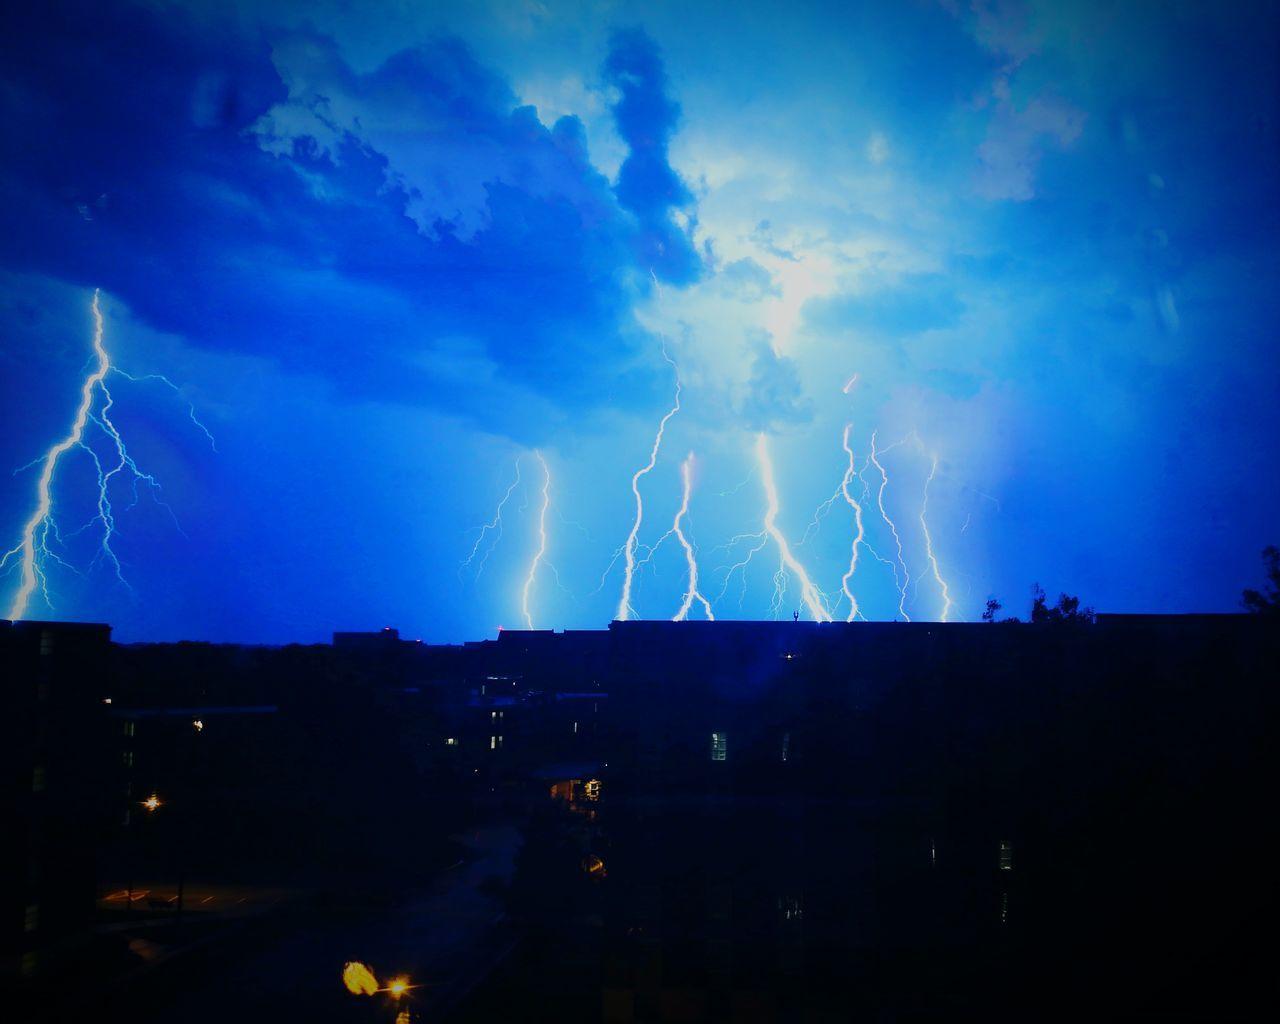 Lightning Lightning Thunderstorm Storm Storm Cloud Night Outdoors EyeEmNewHere Neon Life Honor 6x